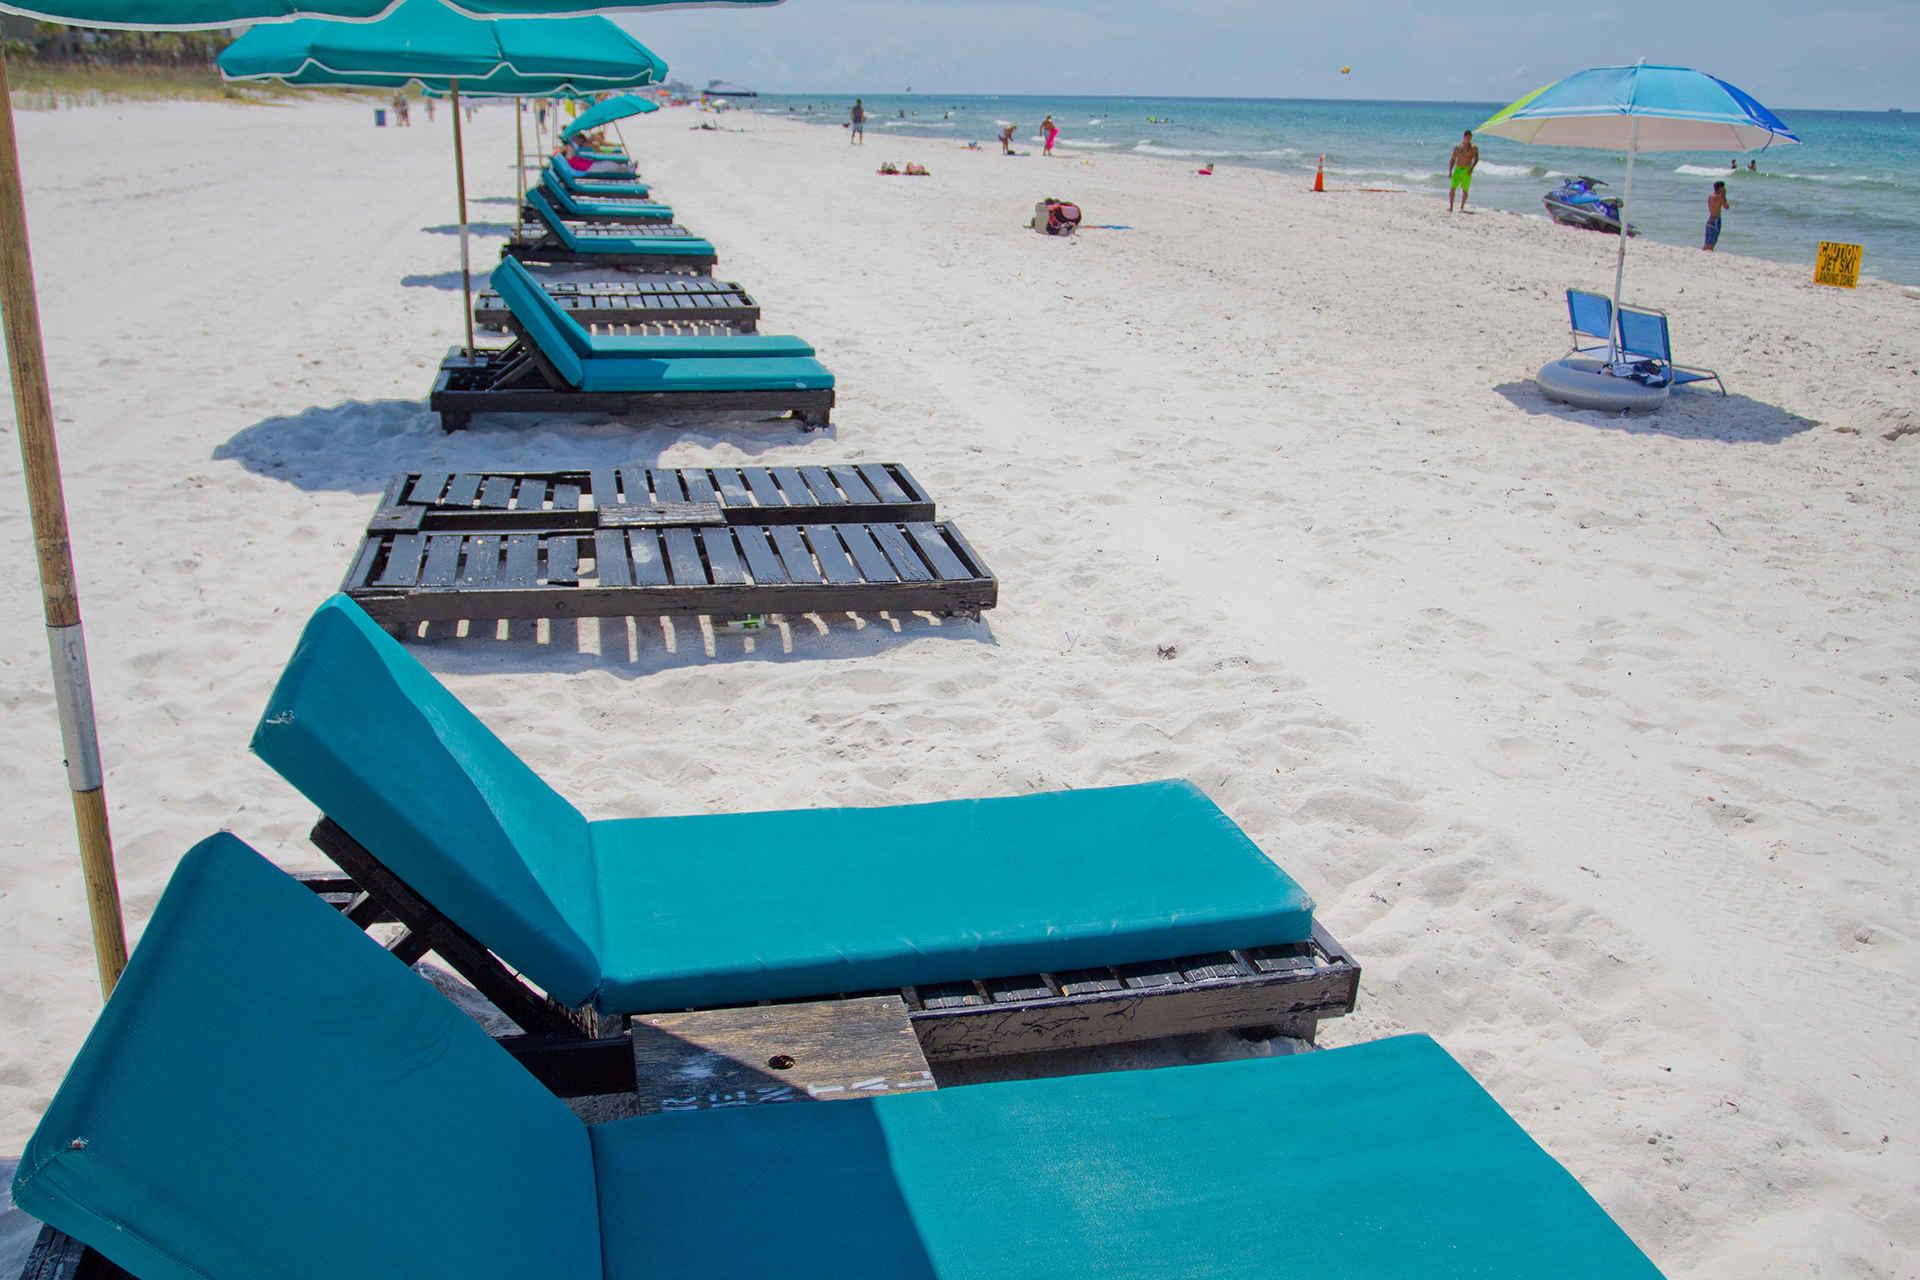 Beach Tower By The Sea in Panama City Beach, FL